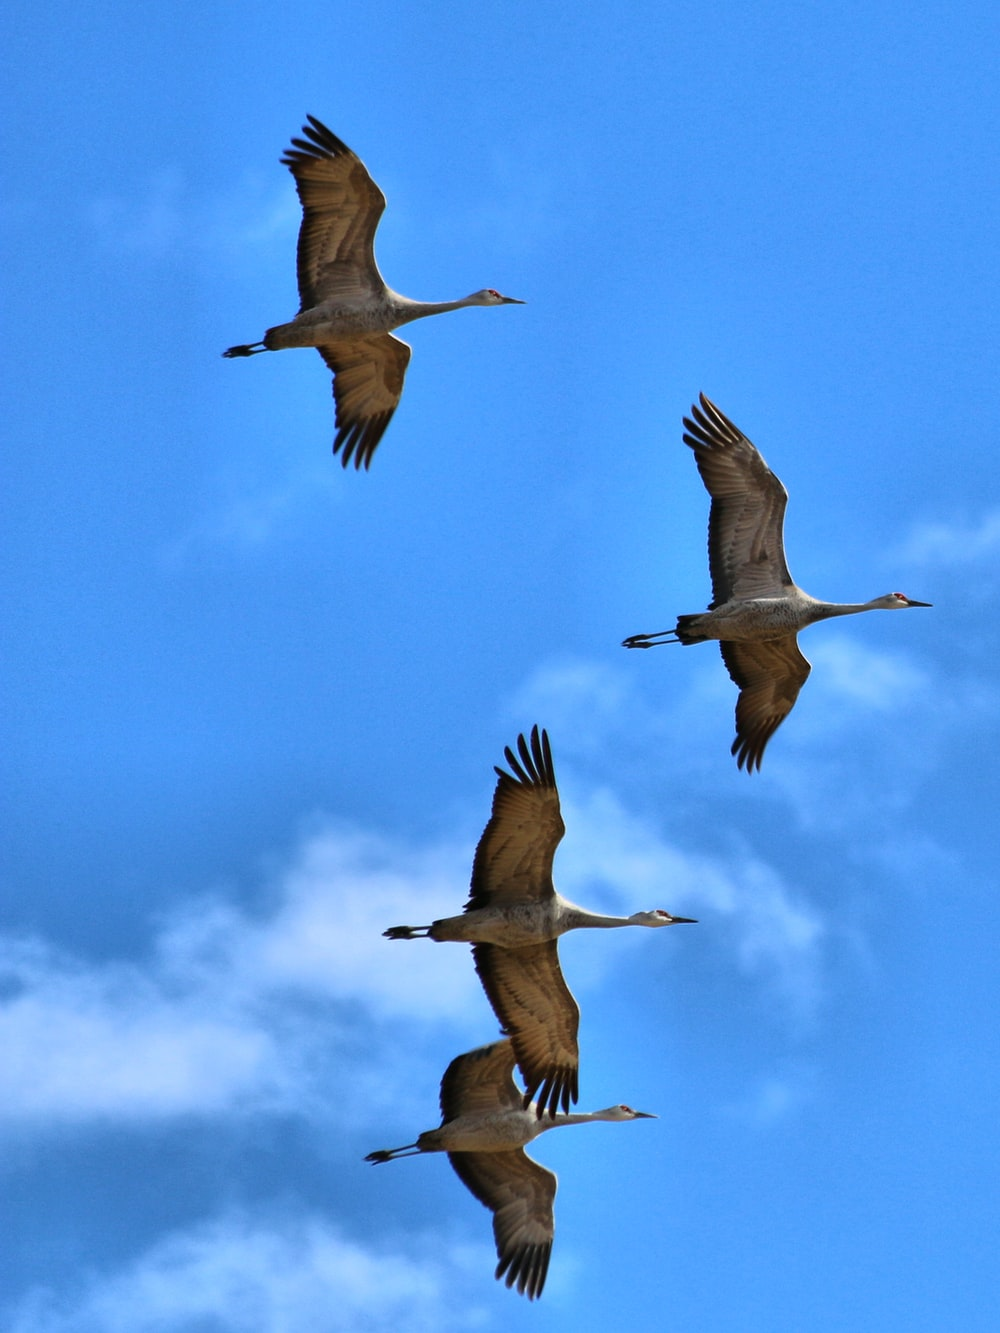 three white birds flying under blue sky during daytime